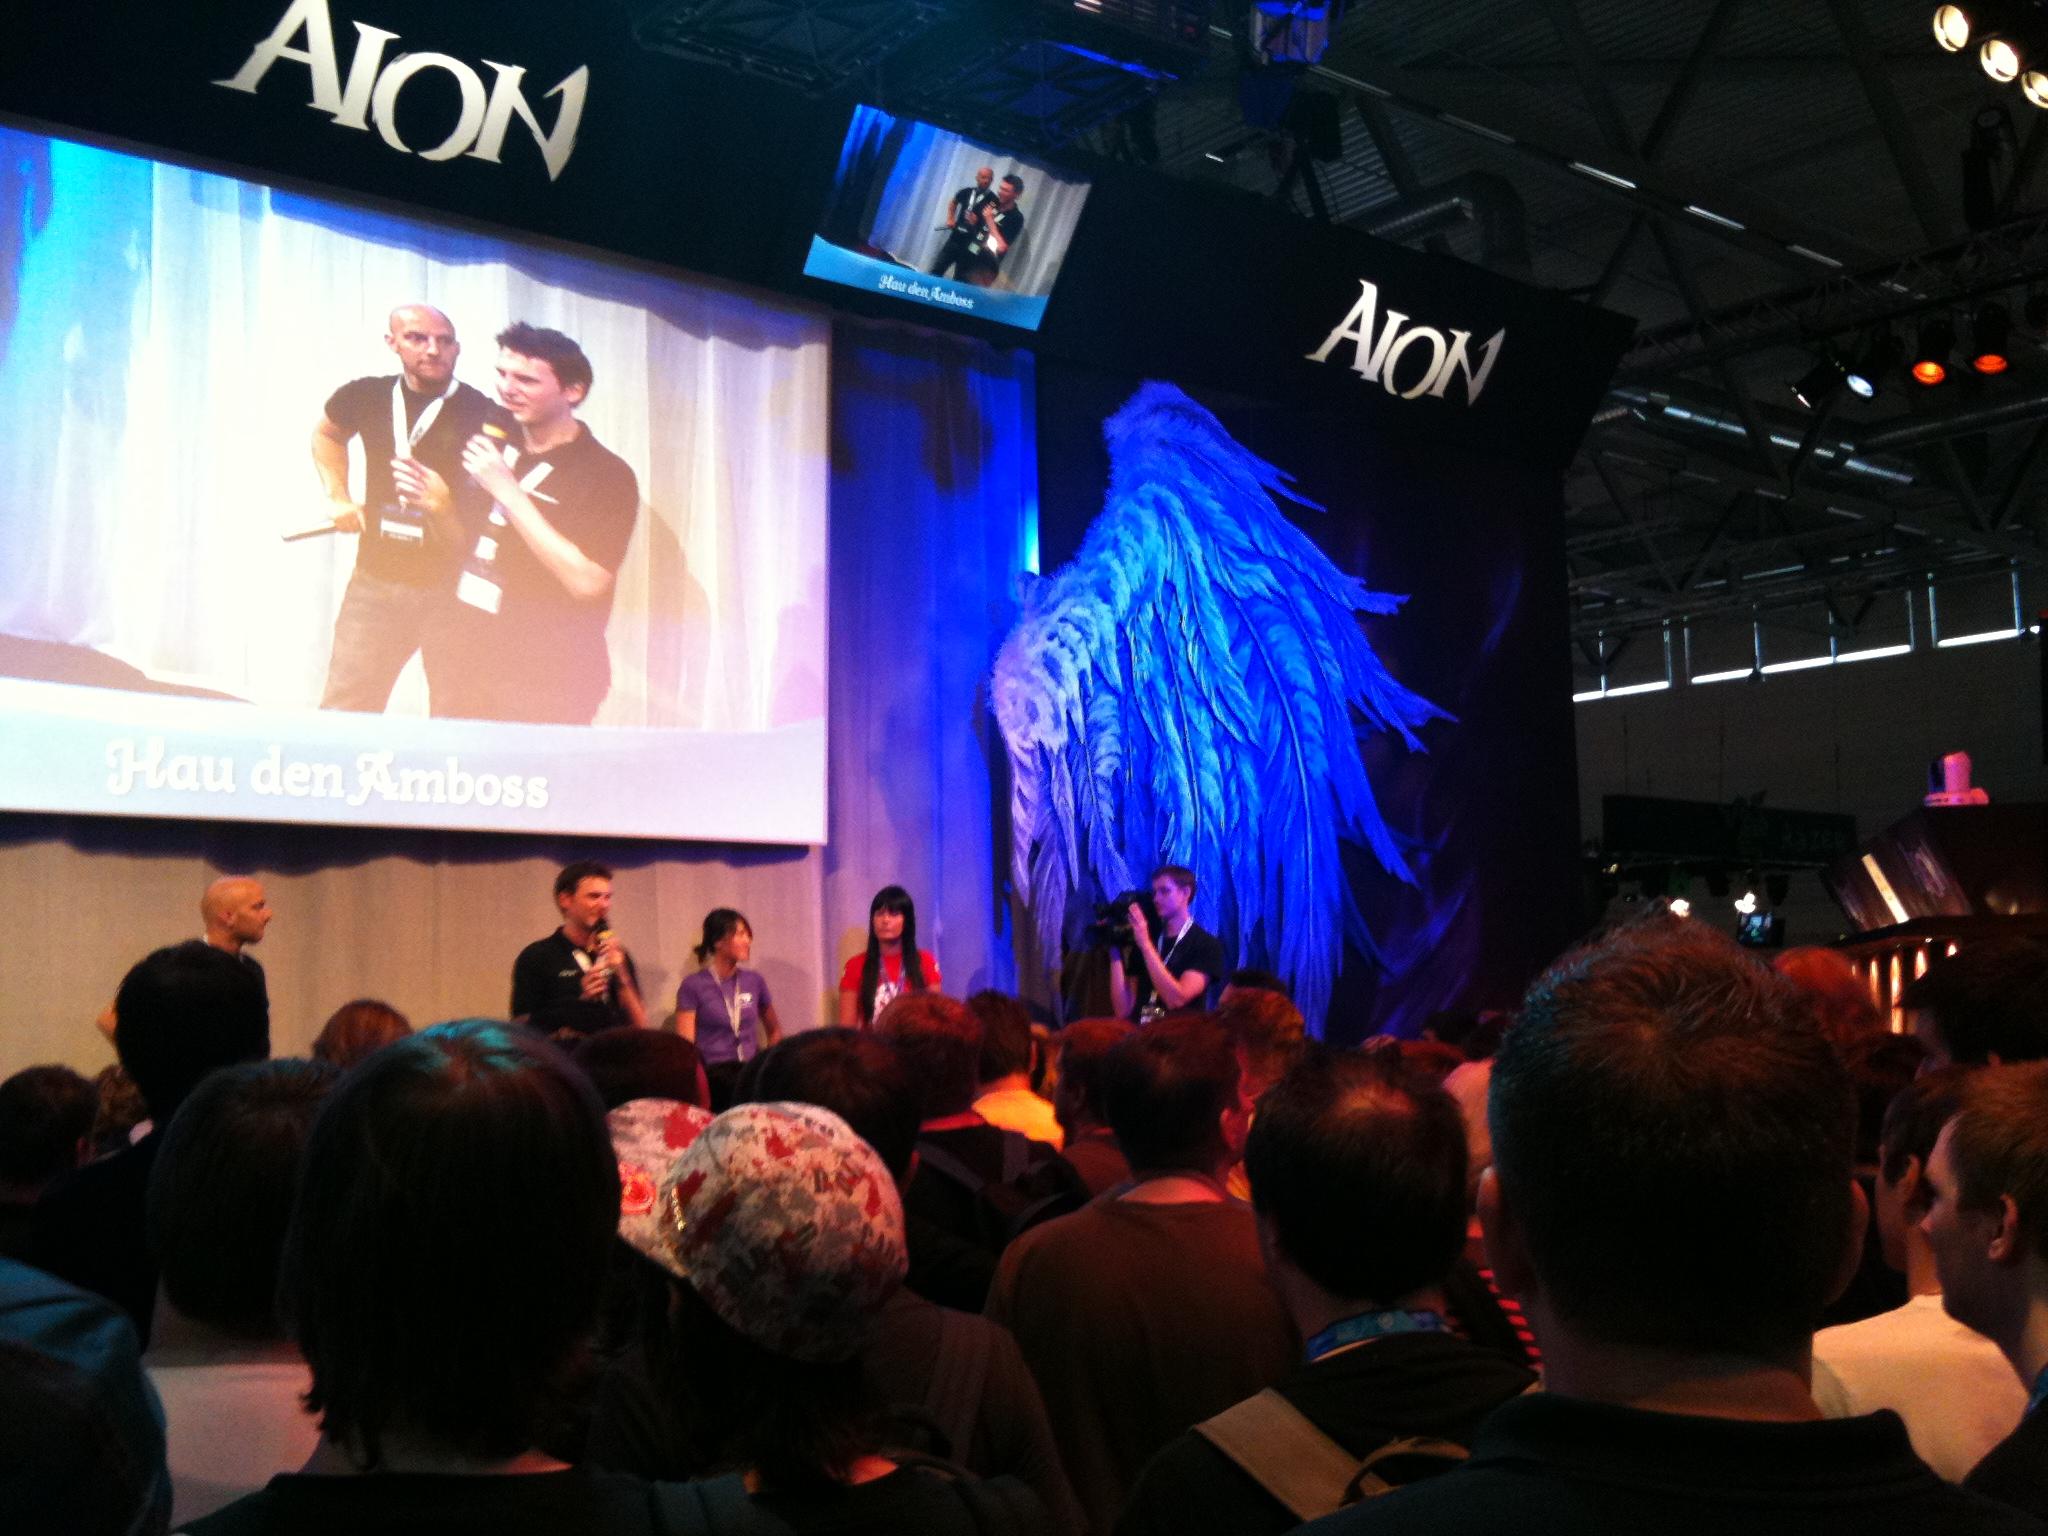 aion-gamescon-pics001